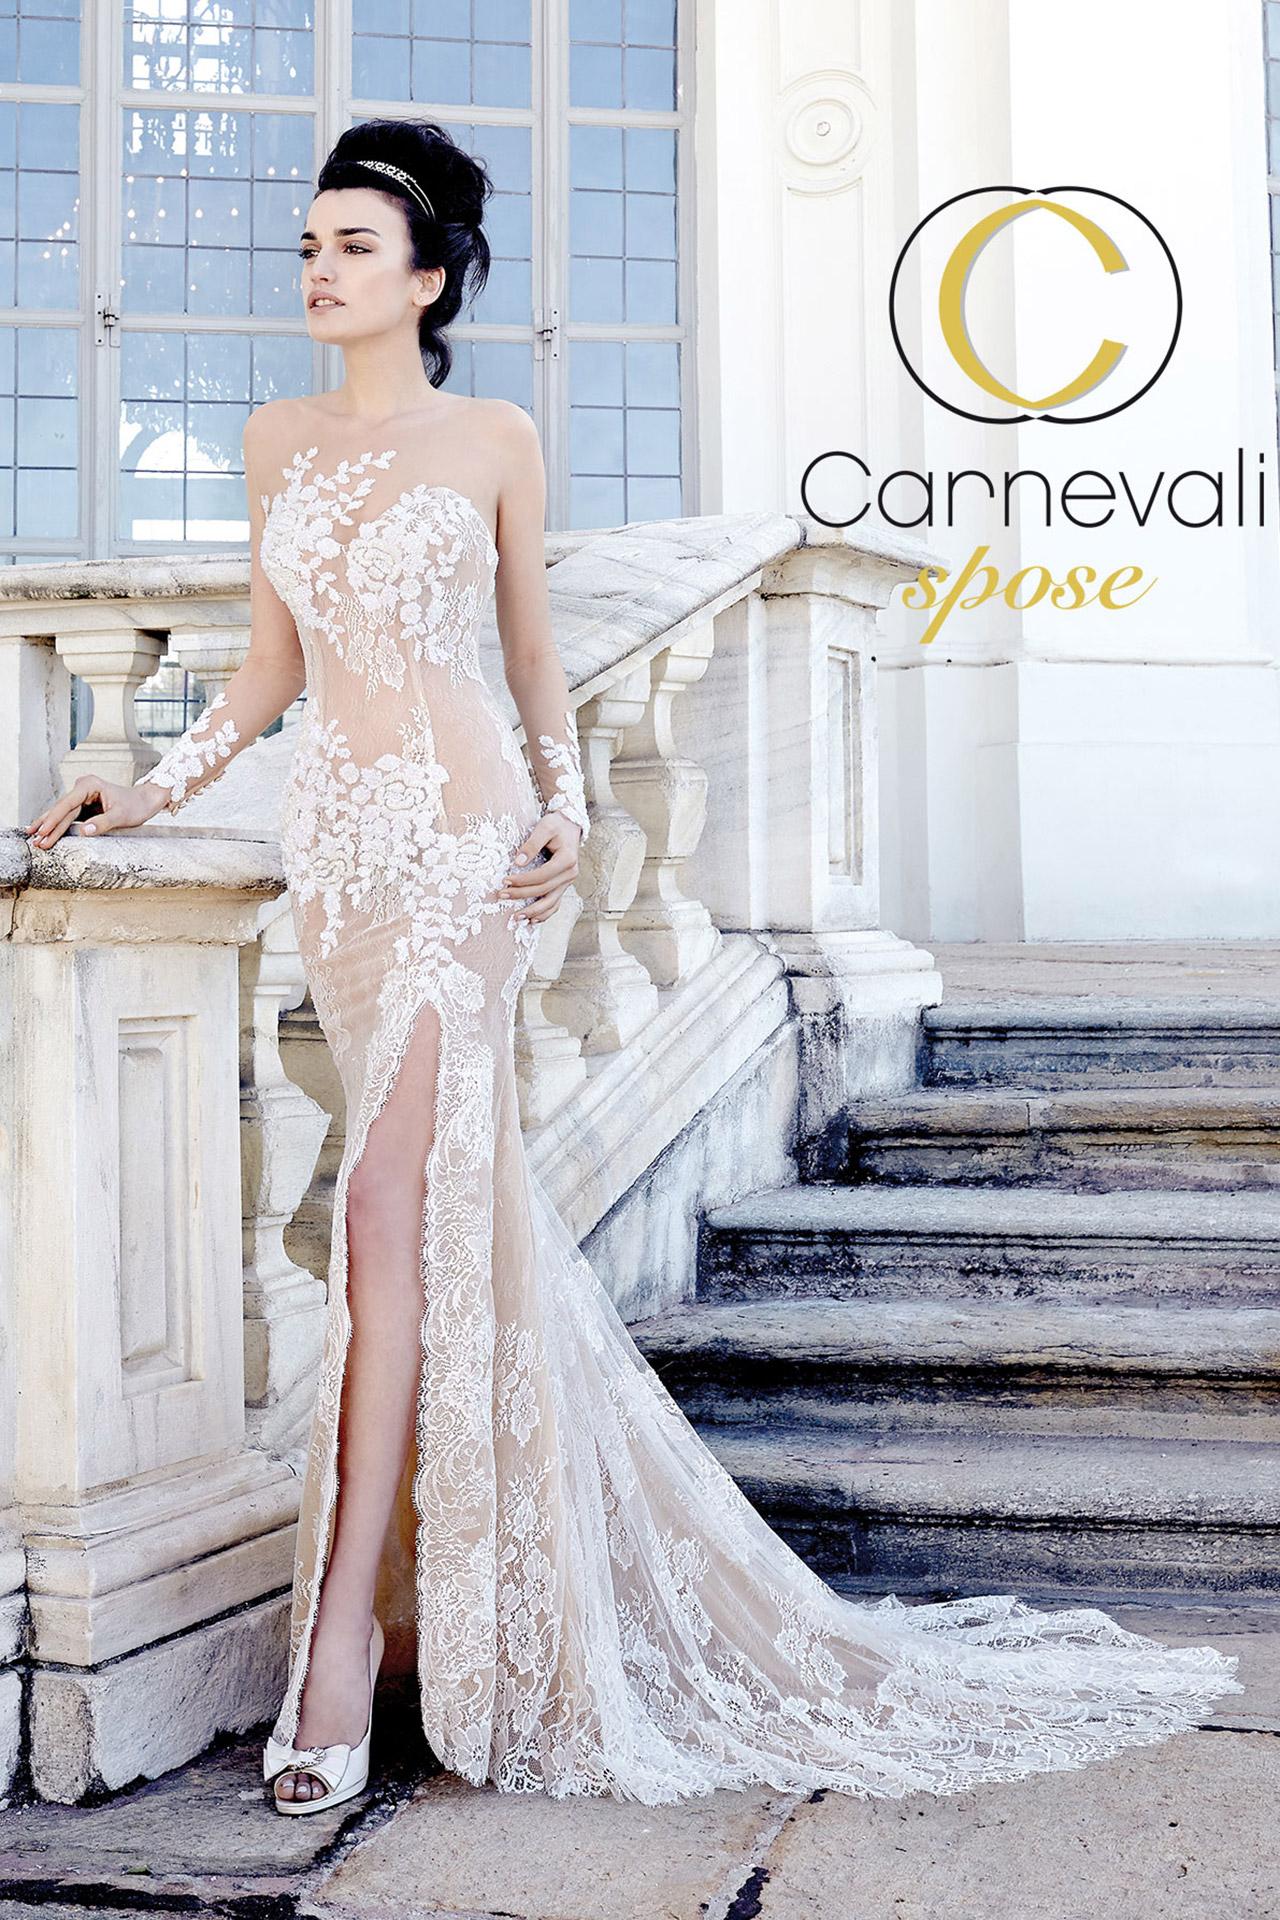 46a88b9fe335 STEFANO BLANDALEONE 1632 - Carnevali Spose